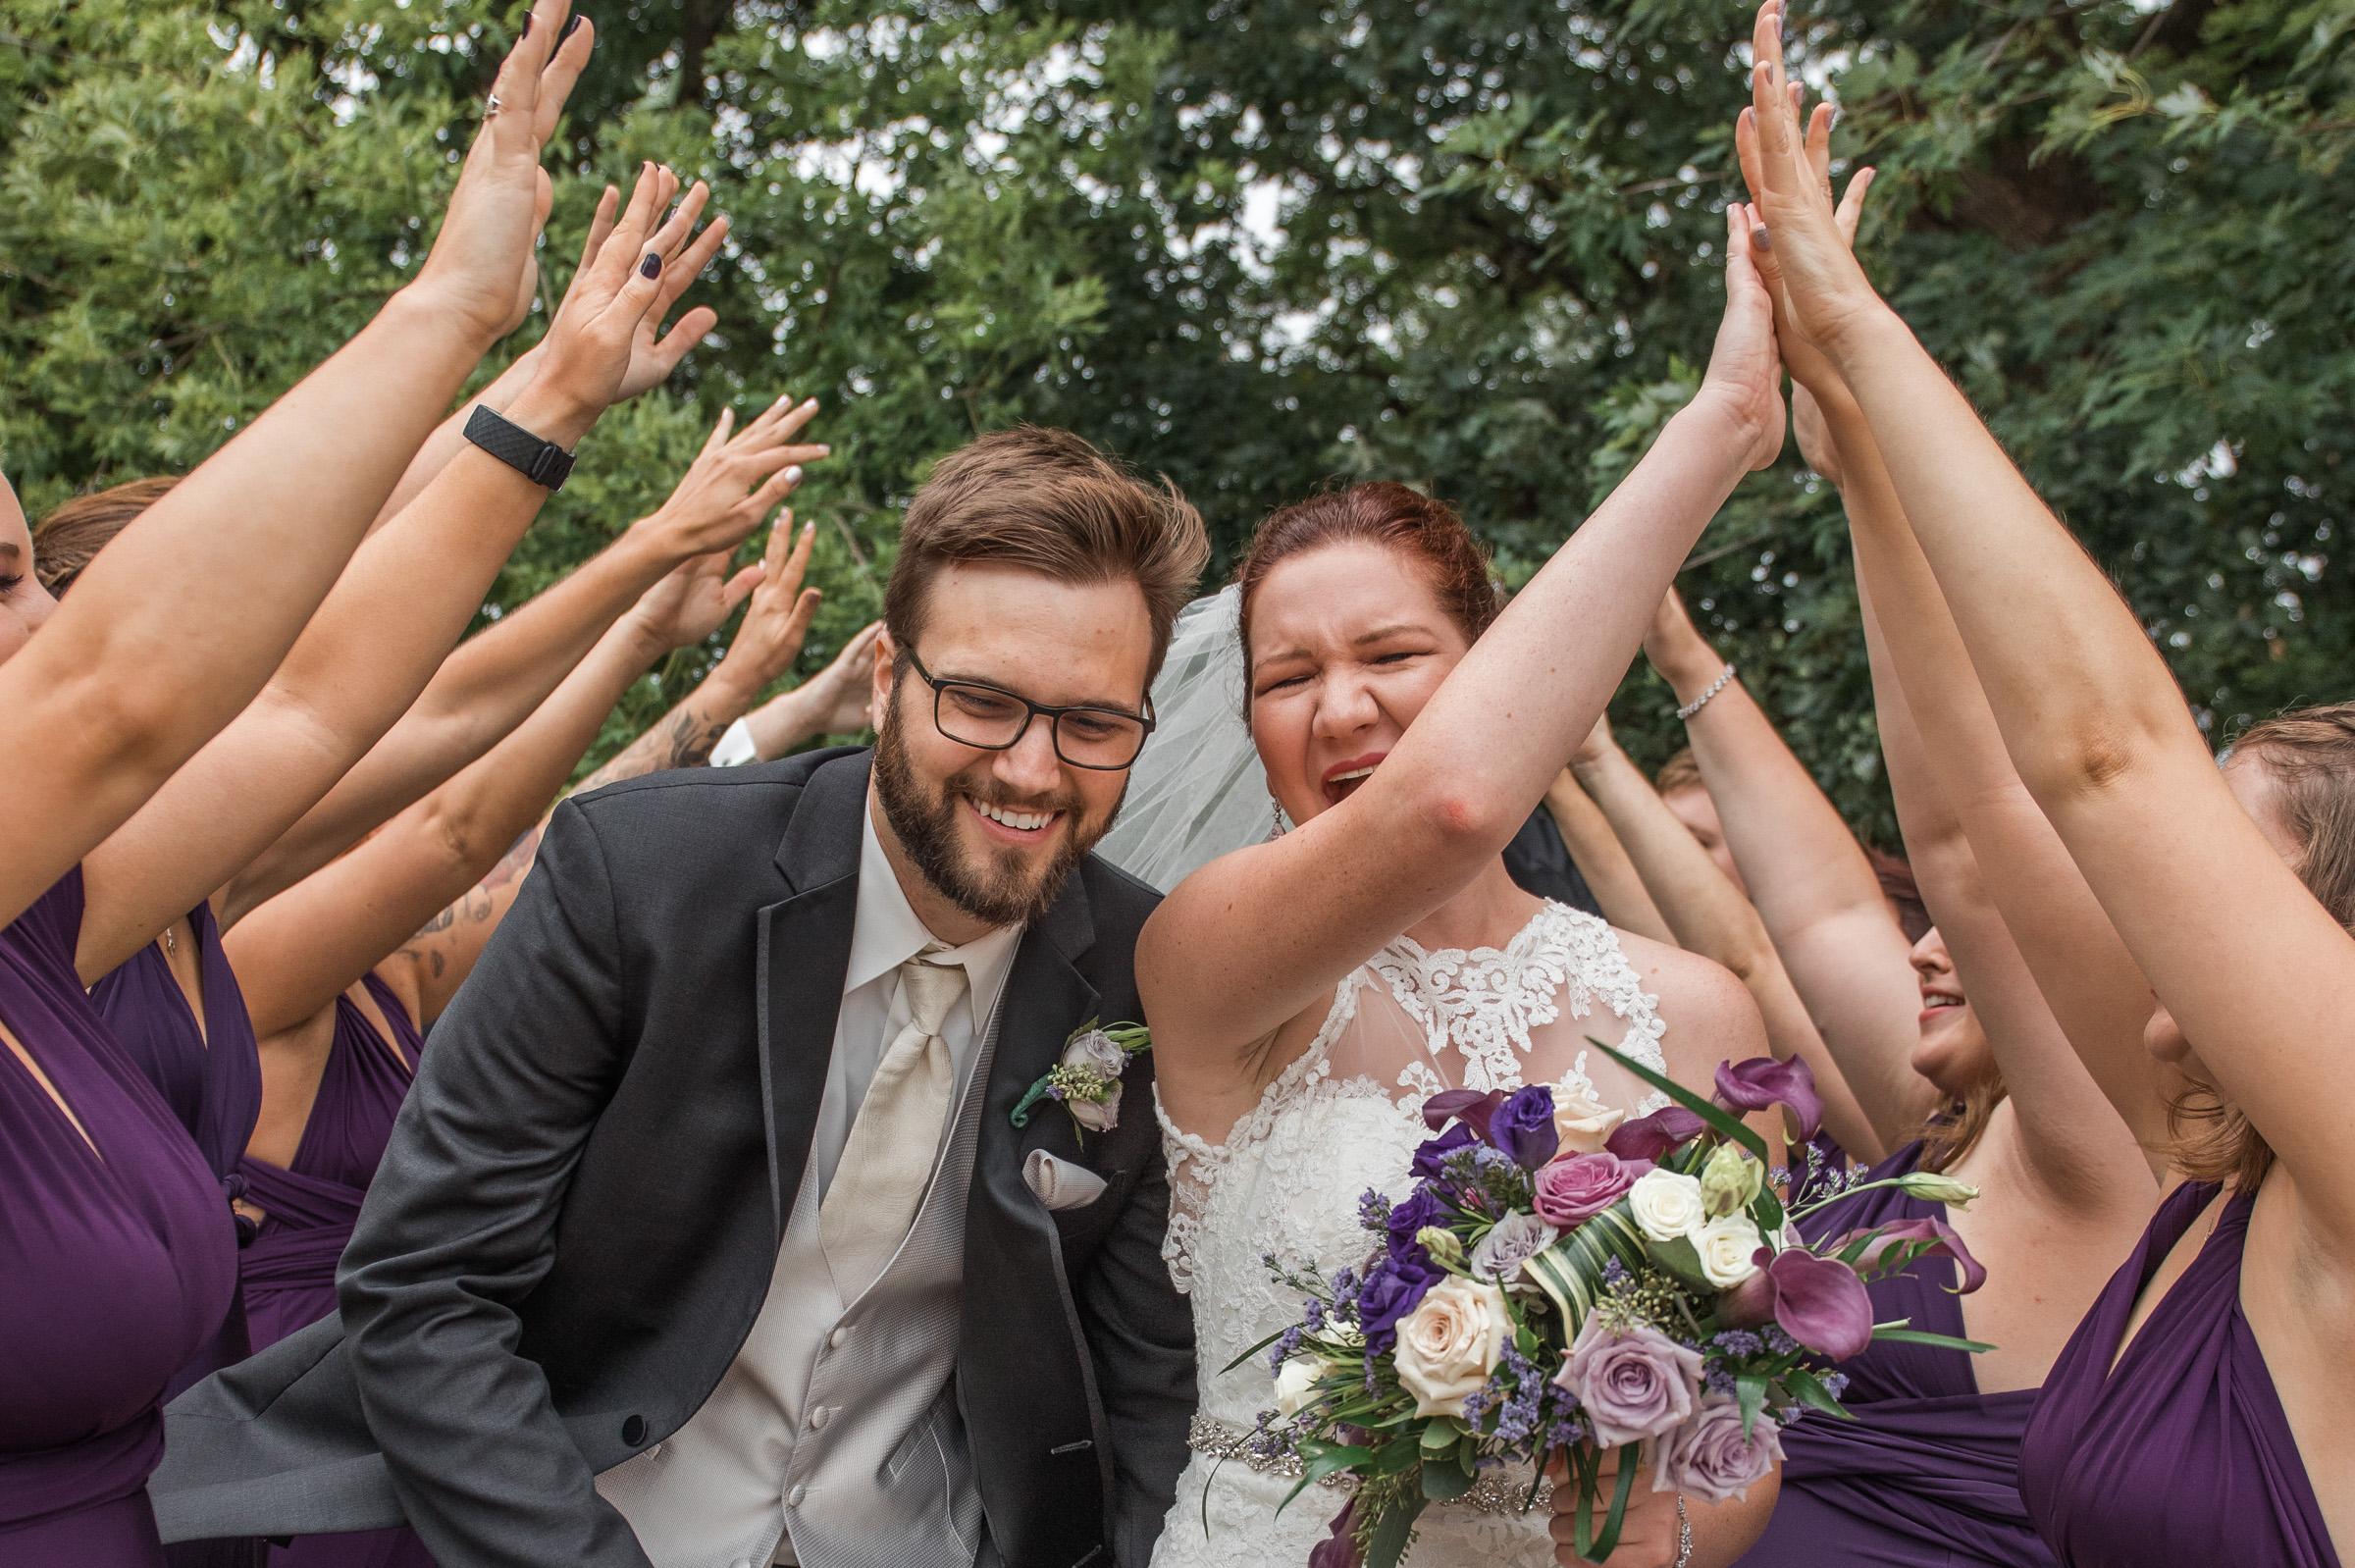 johnston_iowa_wedding_photographers-20.jpg